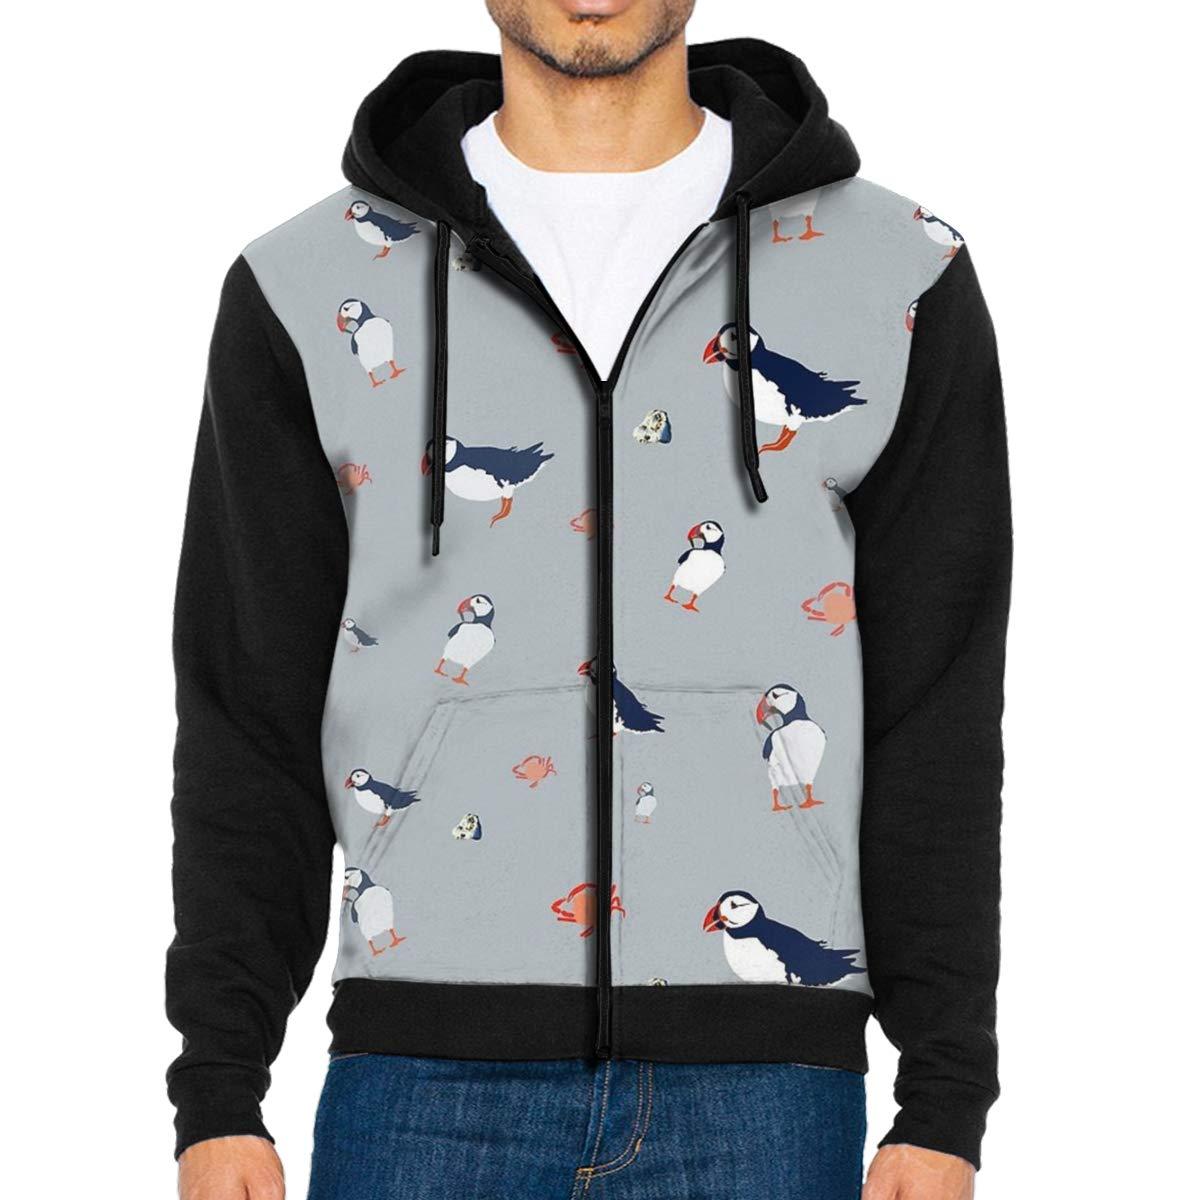 LXP FZD Mens Puffins Pattern Fashion Hoodies Cool Jacket Print Zipper Sweatshirts Fleece